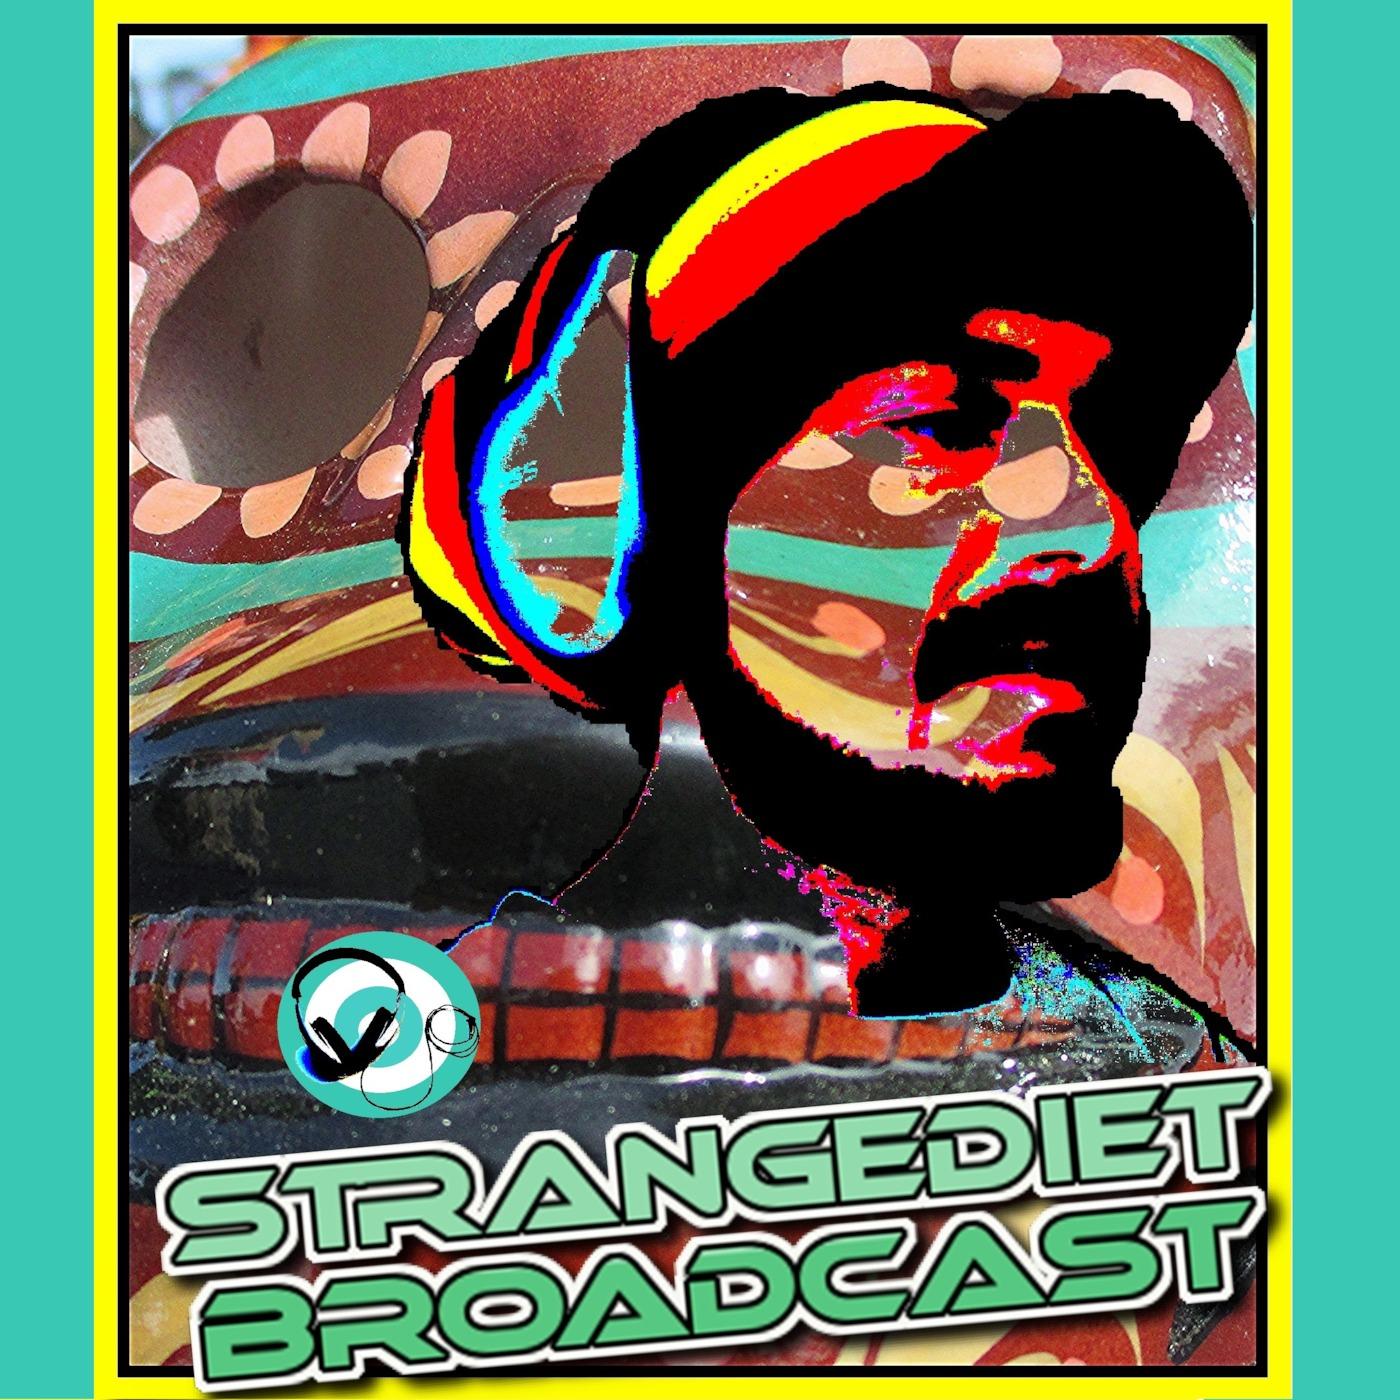 StrangeDiet Broadcast